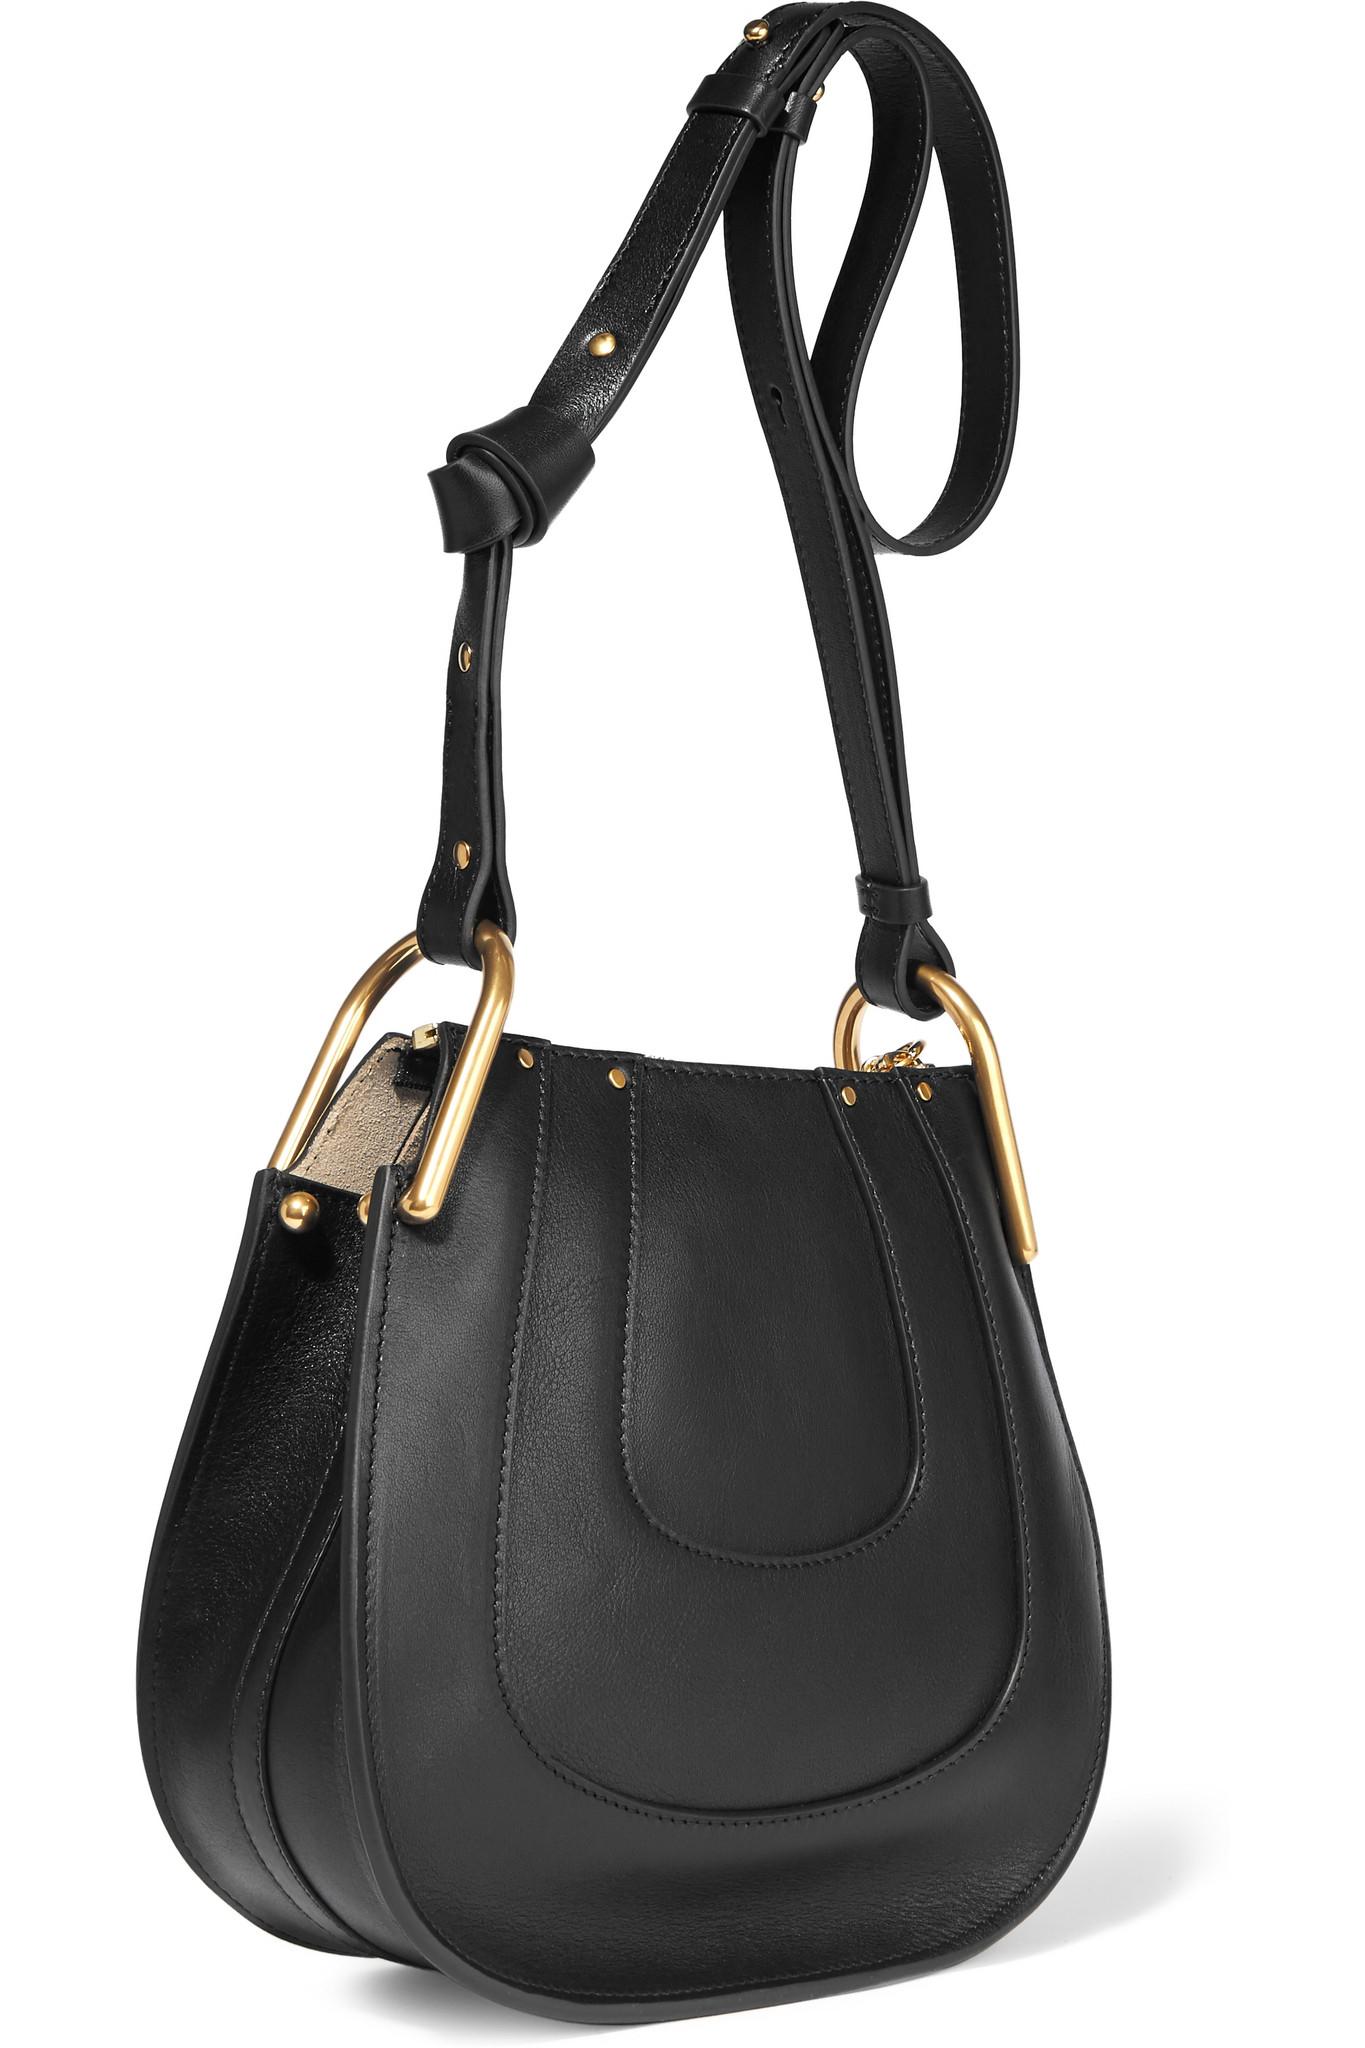 chloe wallets online - chloe hayley nano textured-leather shoulder bag, replica chloe bags